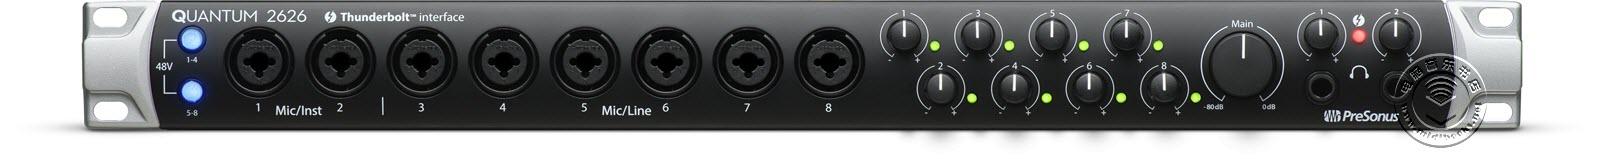 PreSonus发布最新的便携式雷电音频接口Quantum 2626(视频)